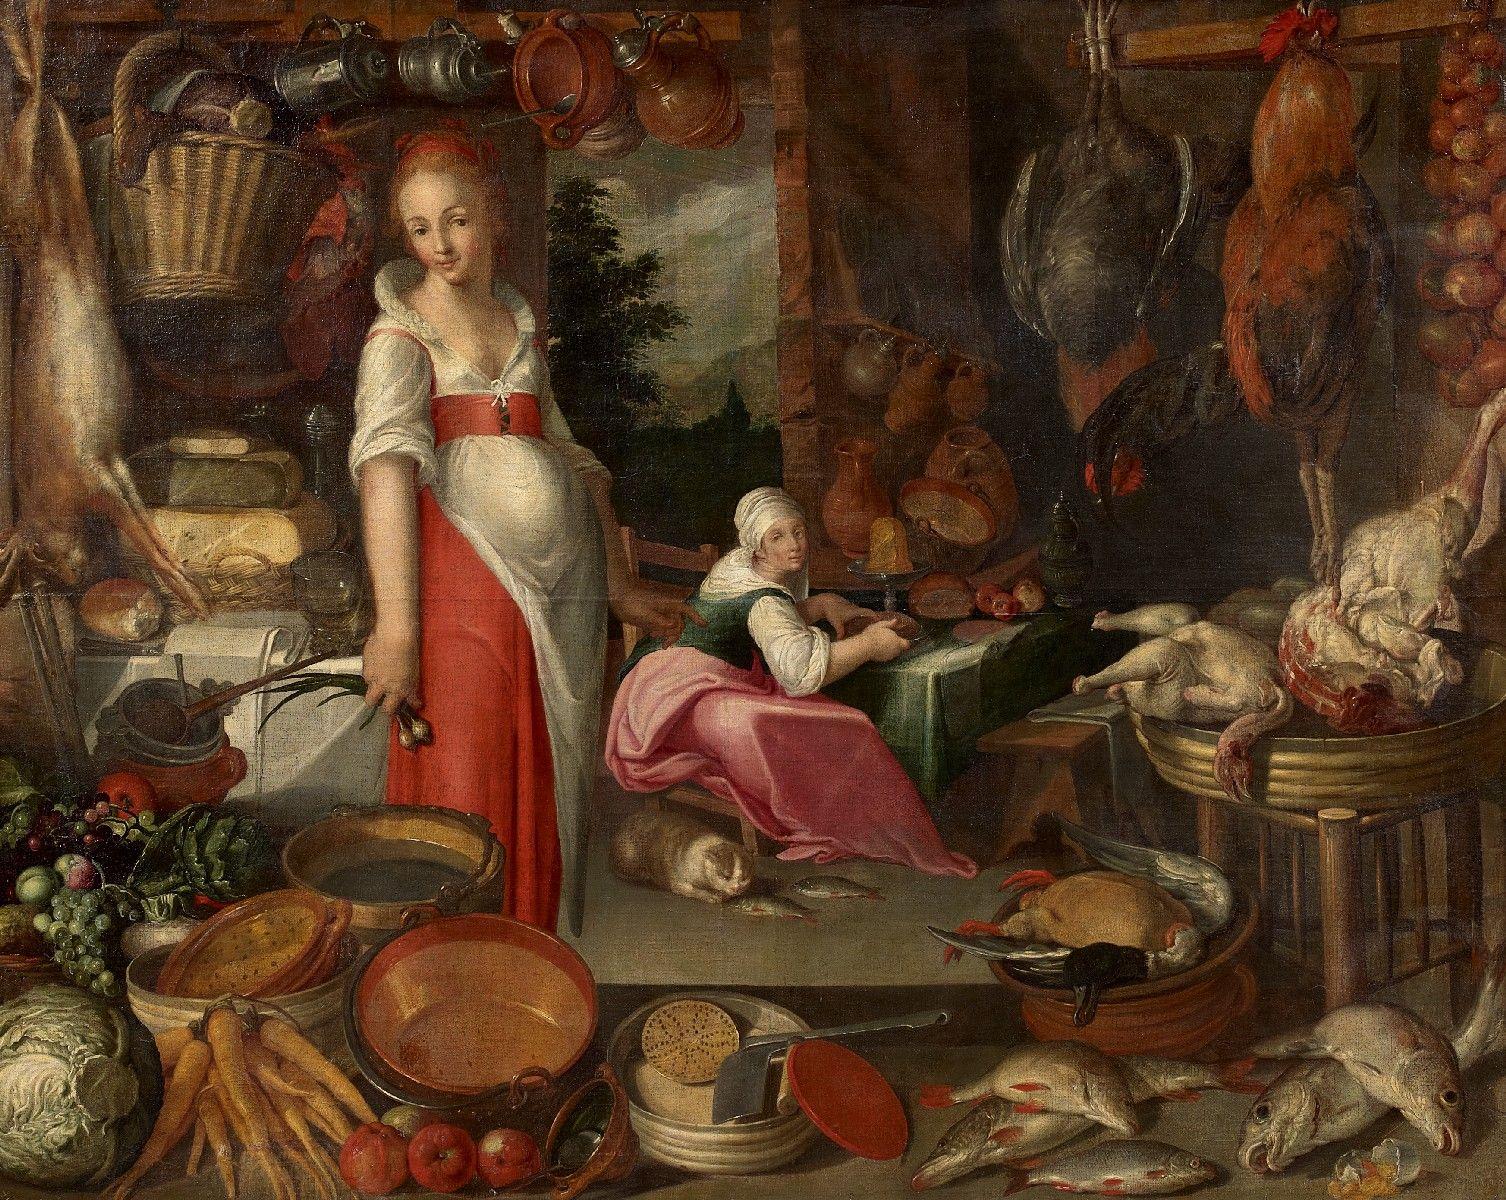 Голландский натюрморт 16 века